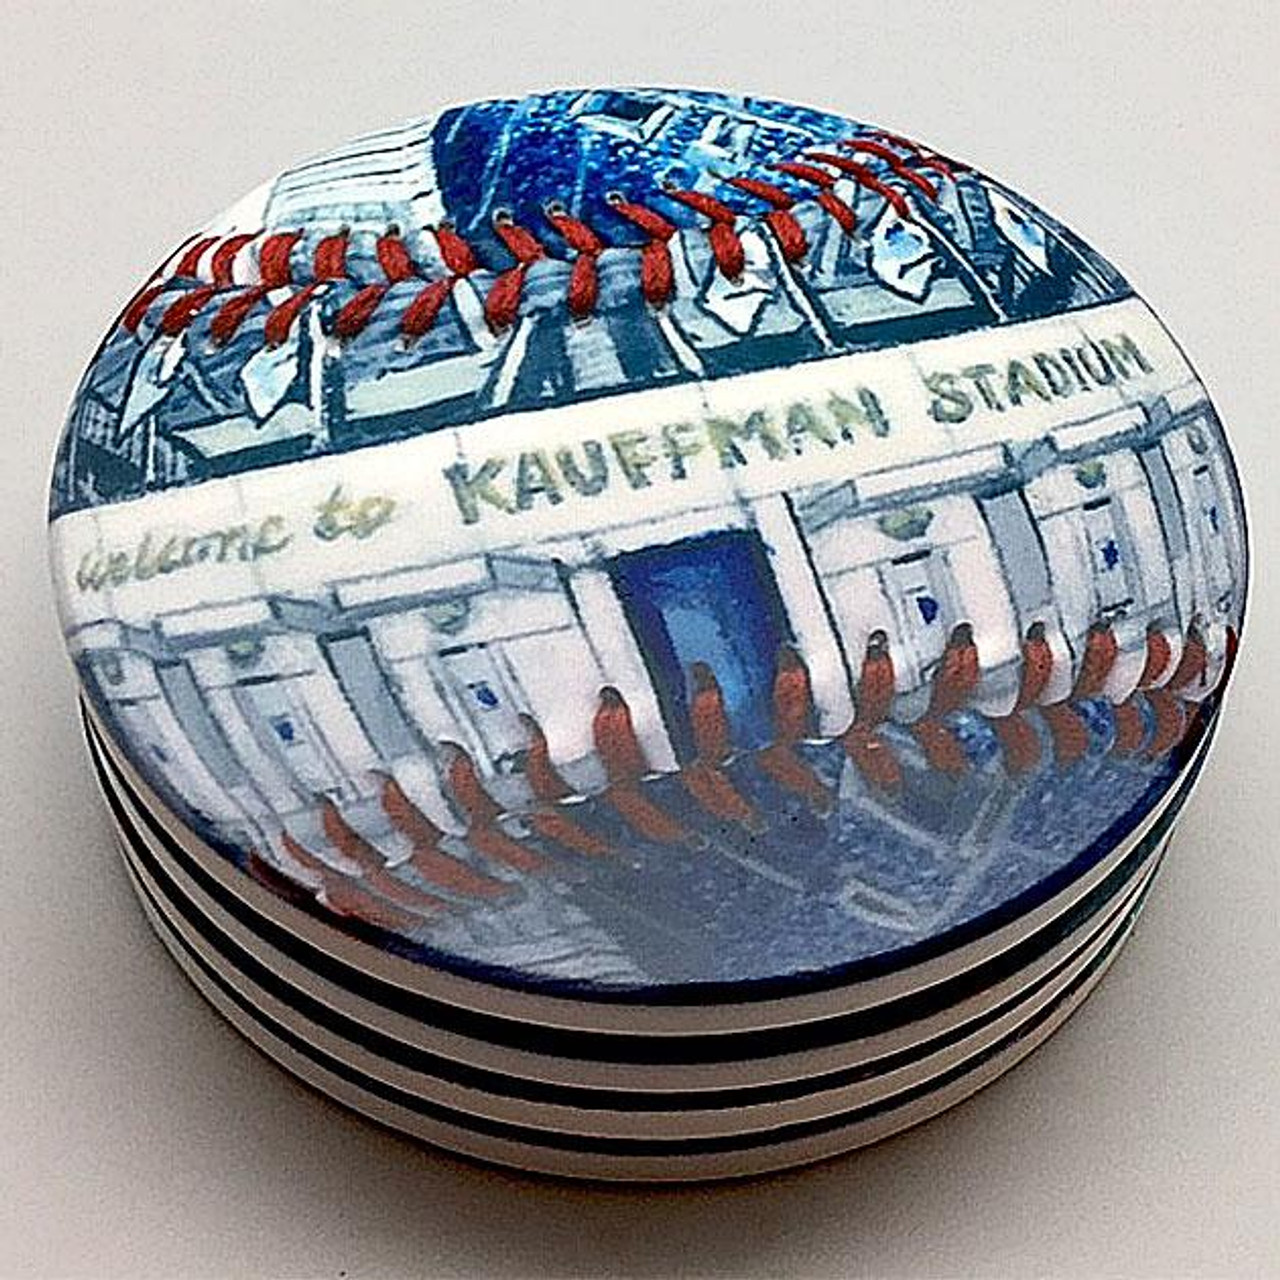 Kauffman Stadium Coaster Set